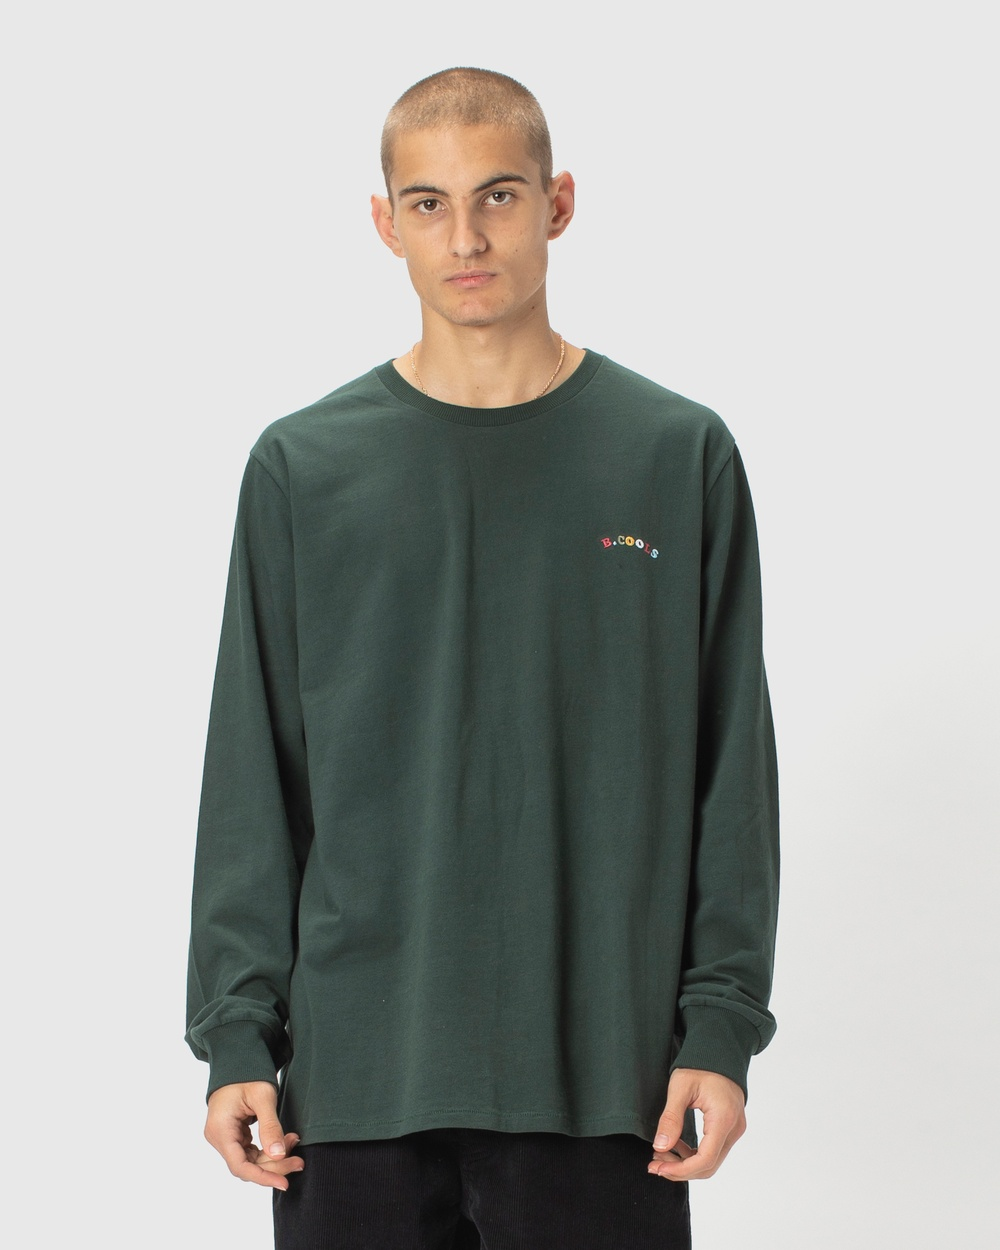 Barney Cools B.Cools Embro LS Tee Long Sleeve T-Shirts Forest Australia